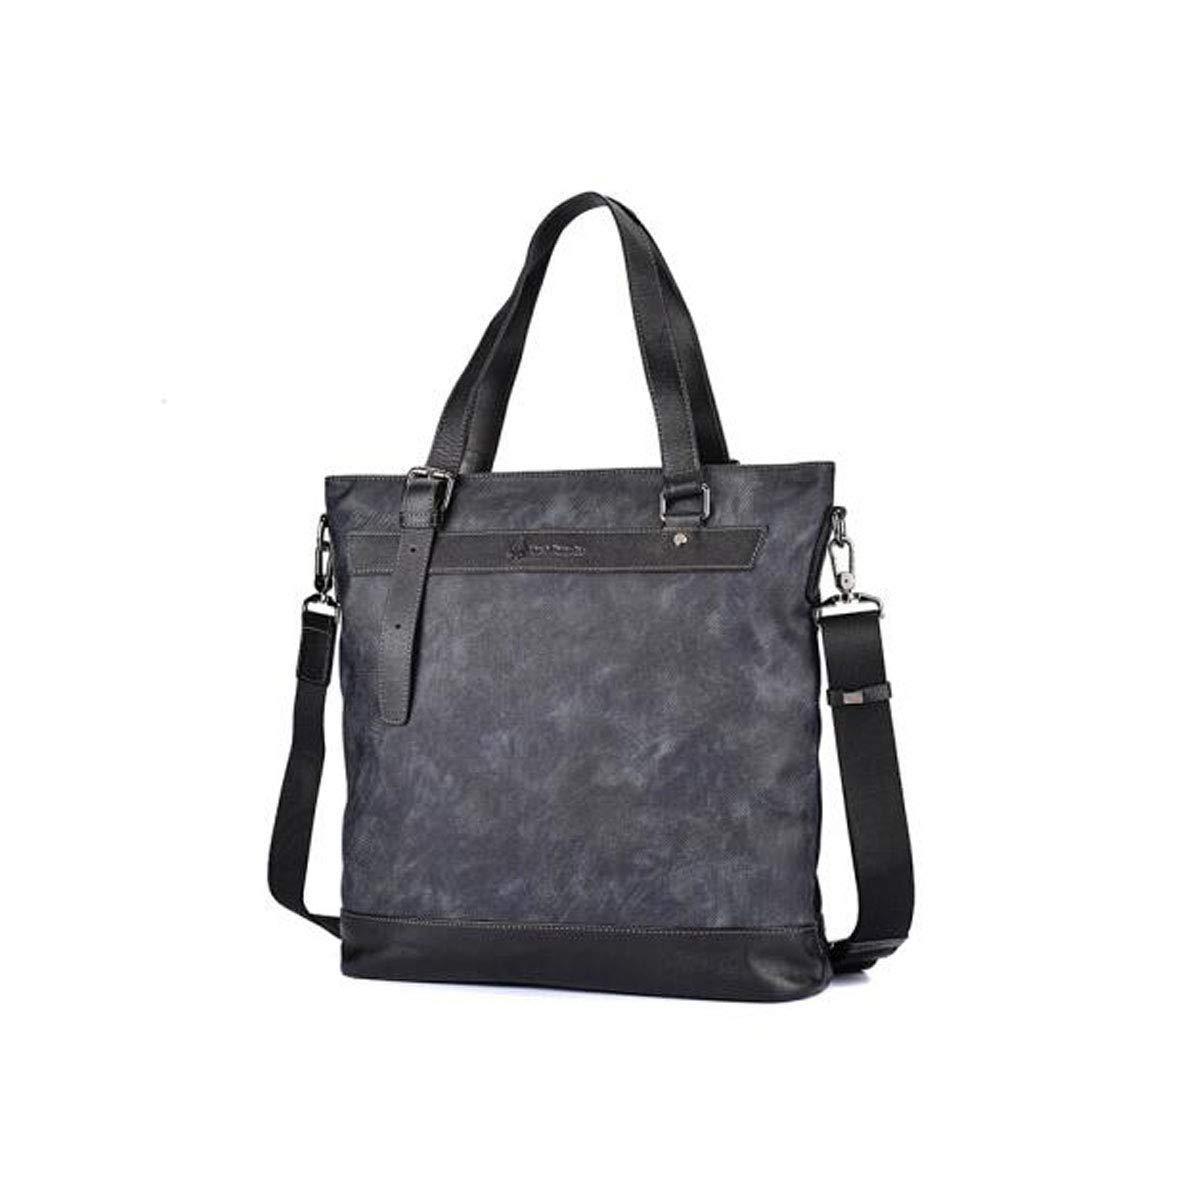 Kuqiqi Briefcase Mens Handbag Oxford Business Casual Backpack Color : Black Black Size: 34.51136cm